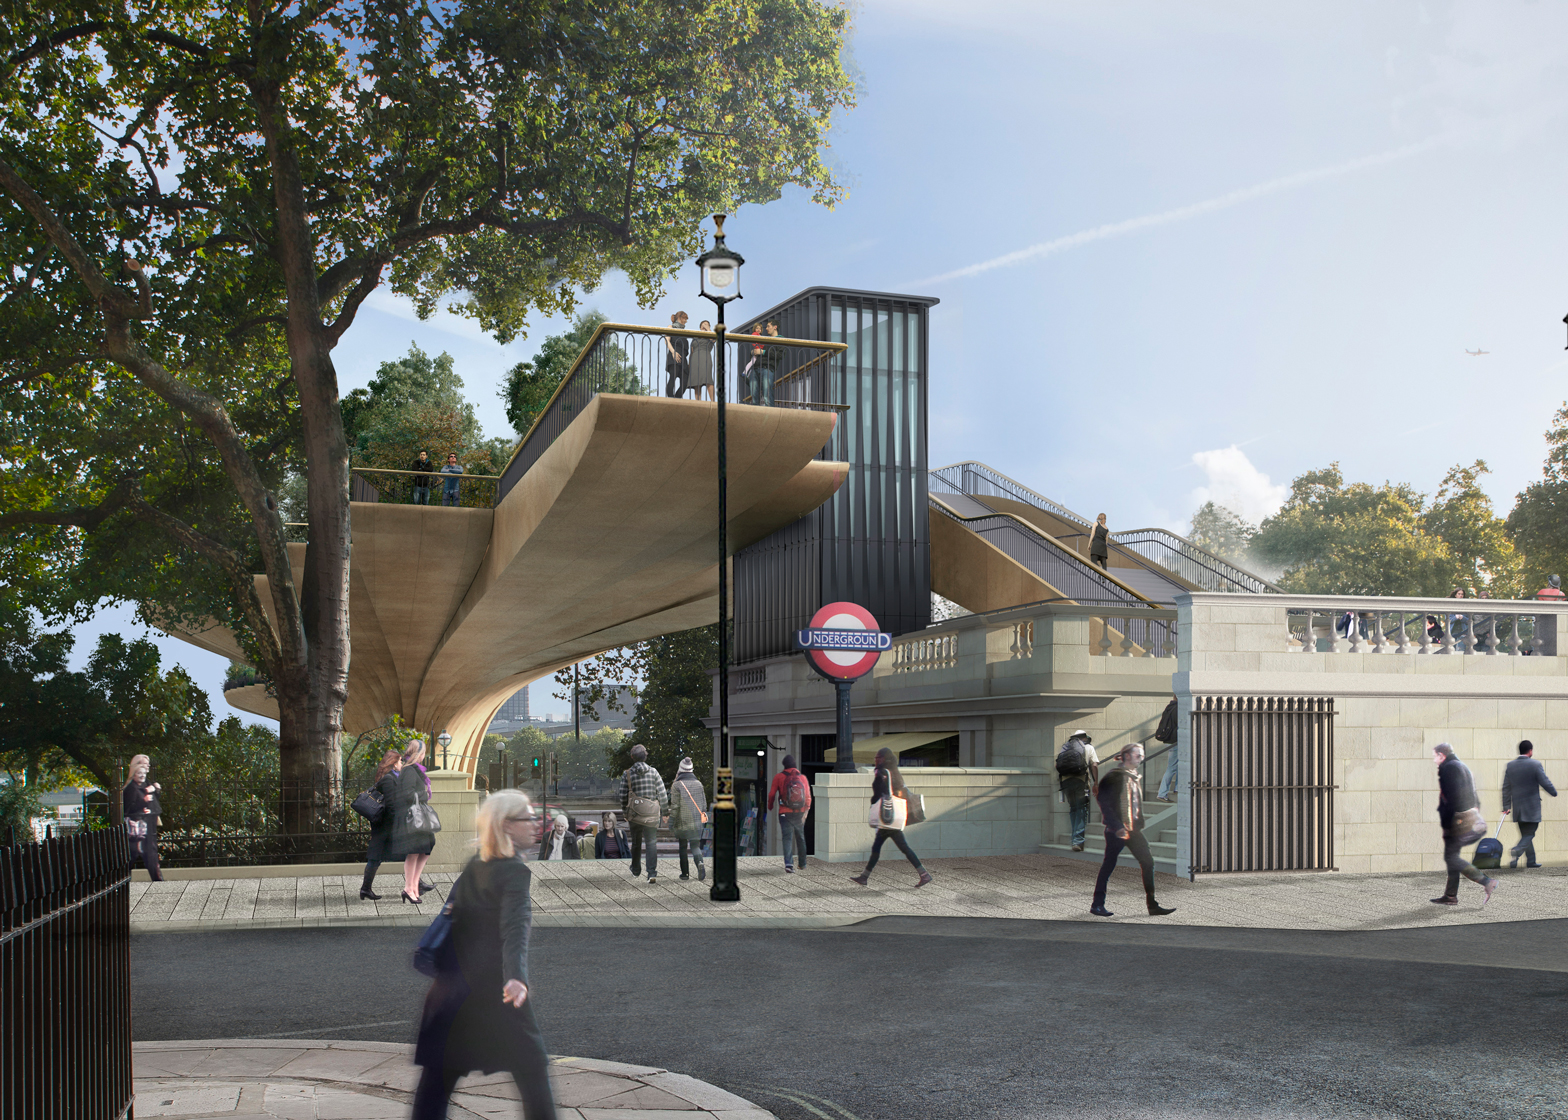 London mayor suspends Garden Bridge construction over funding concerns